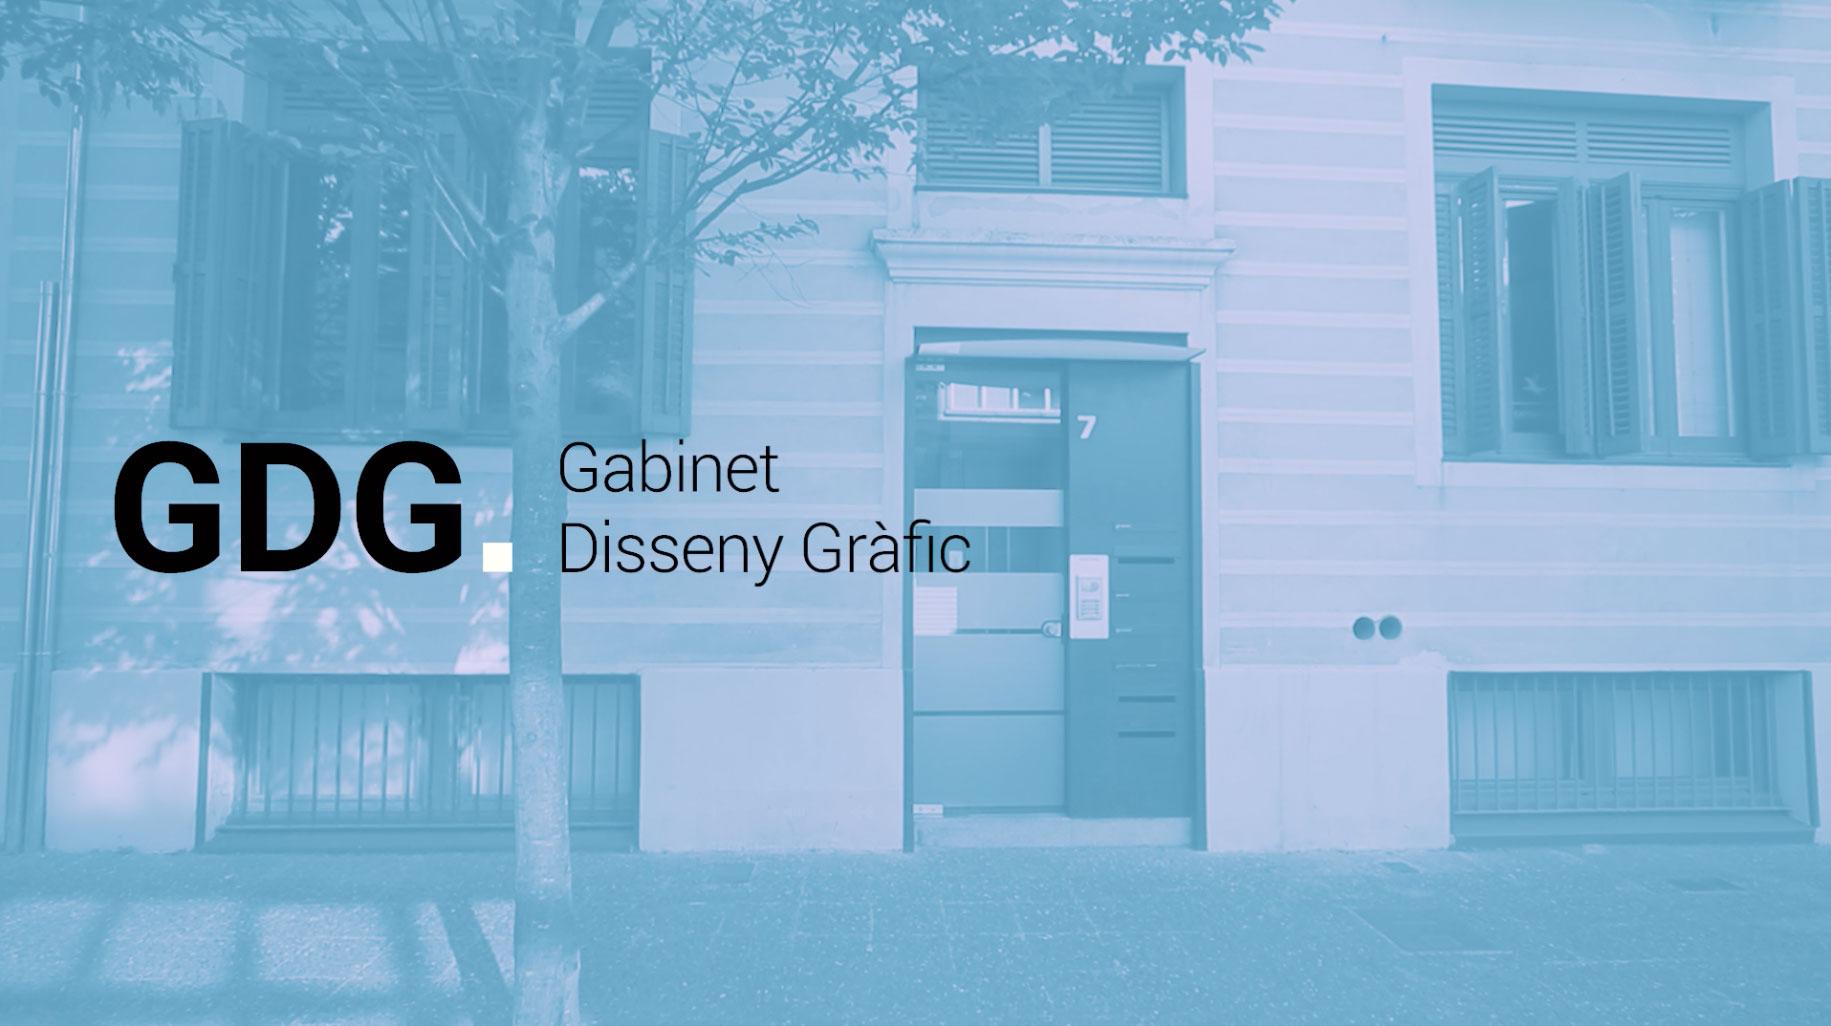 GDG Gabinet de disseny gràfic a Girona